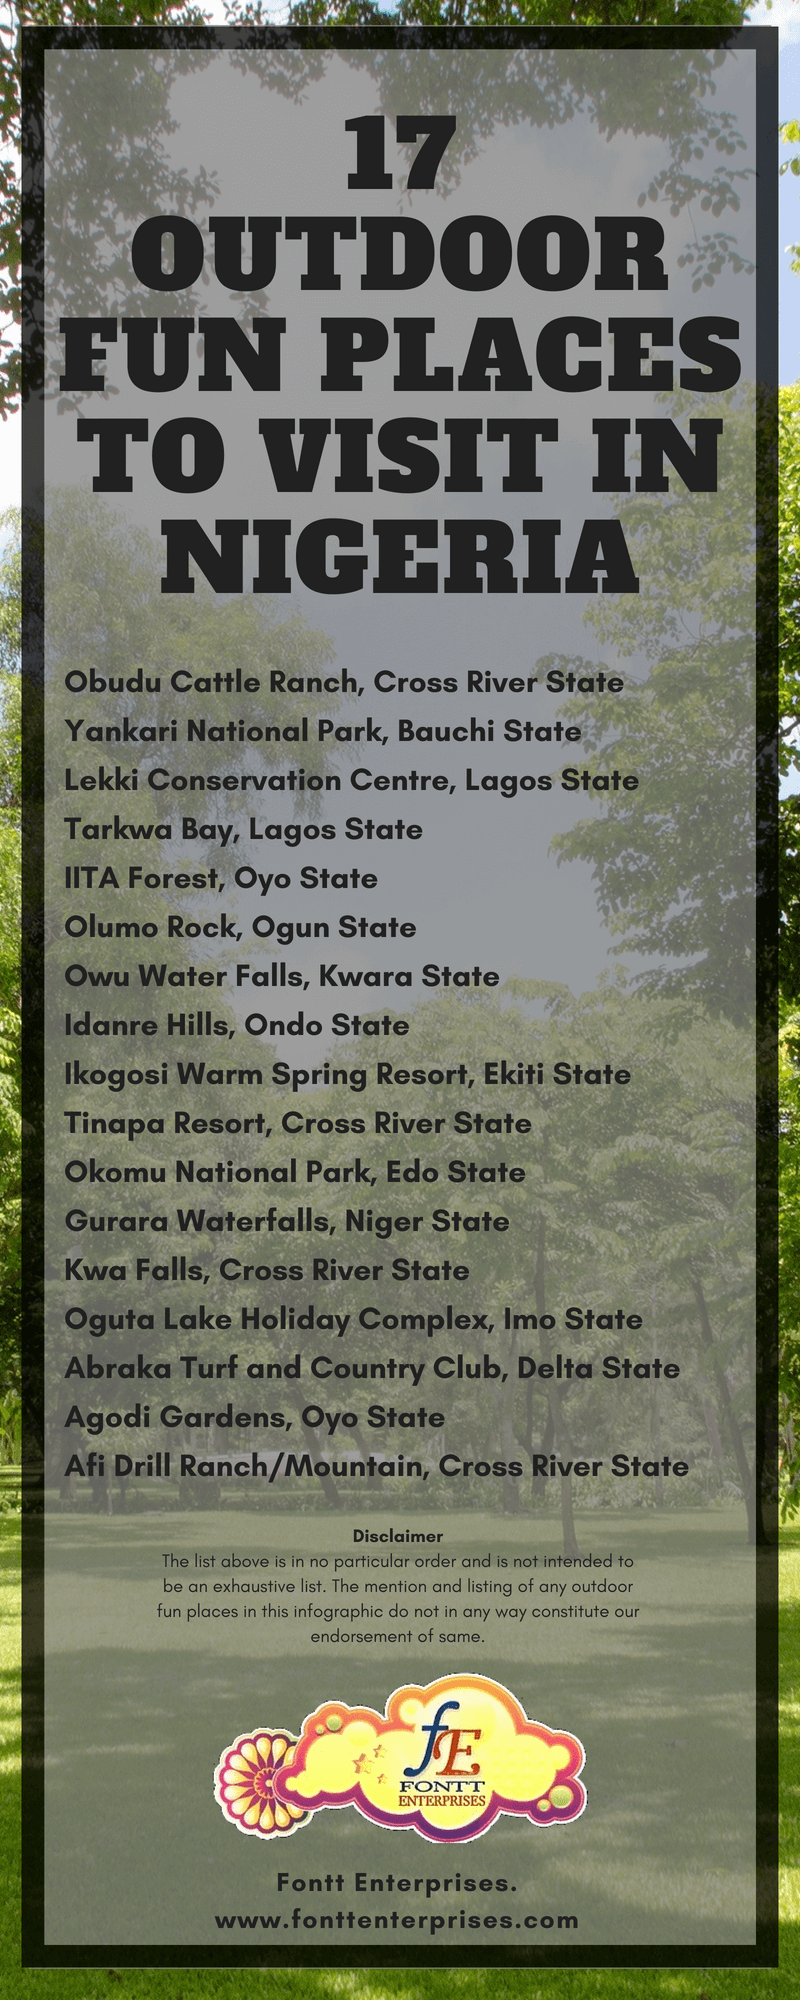 17 Outdoor Fun Places to visit in Nigeria